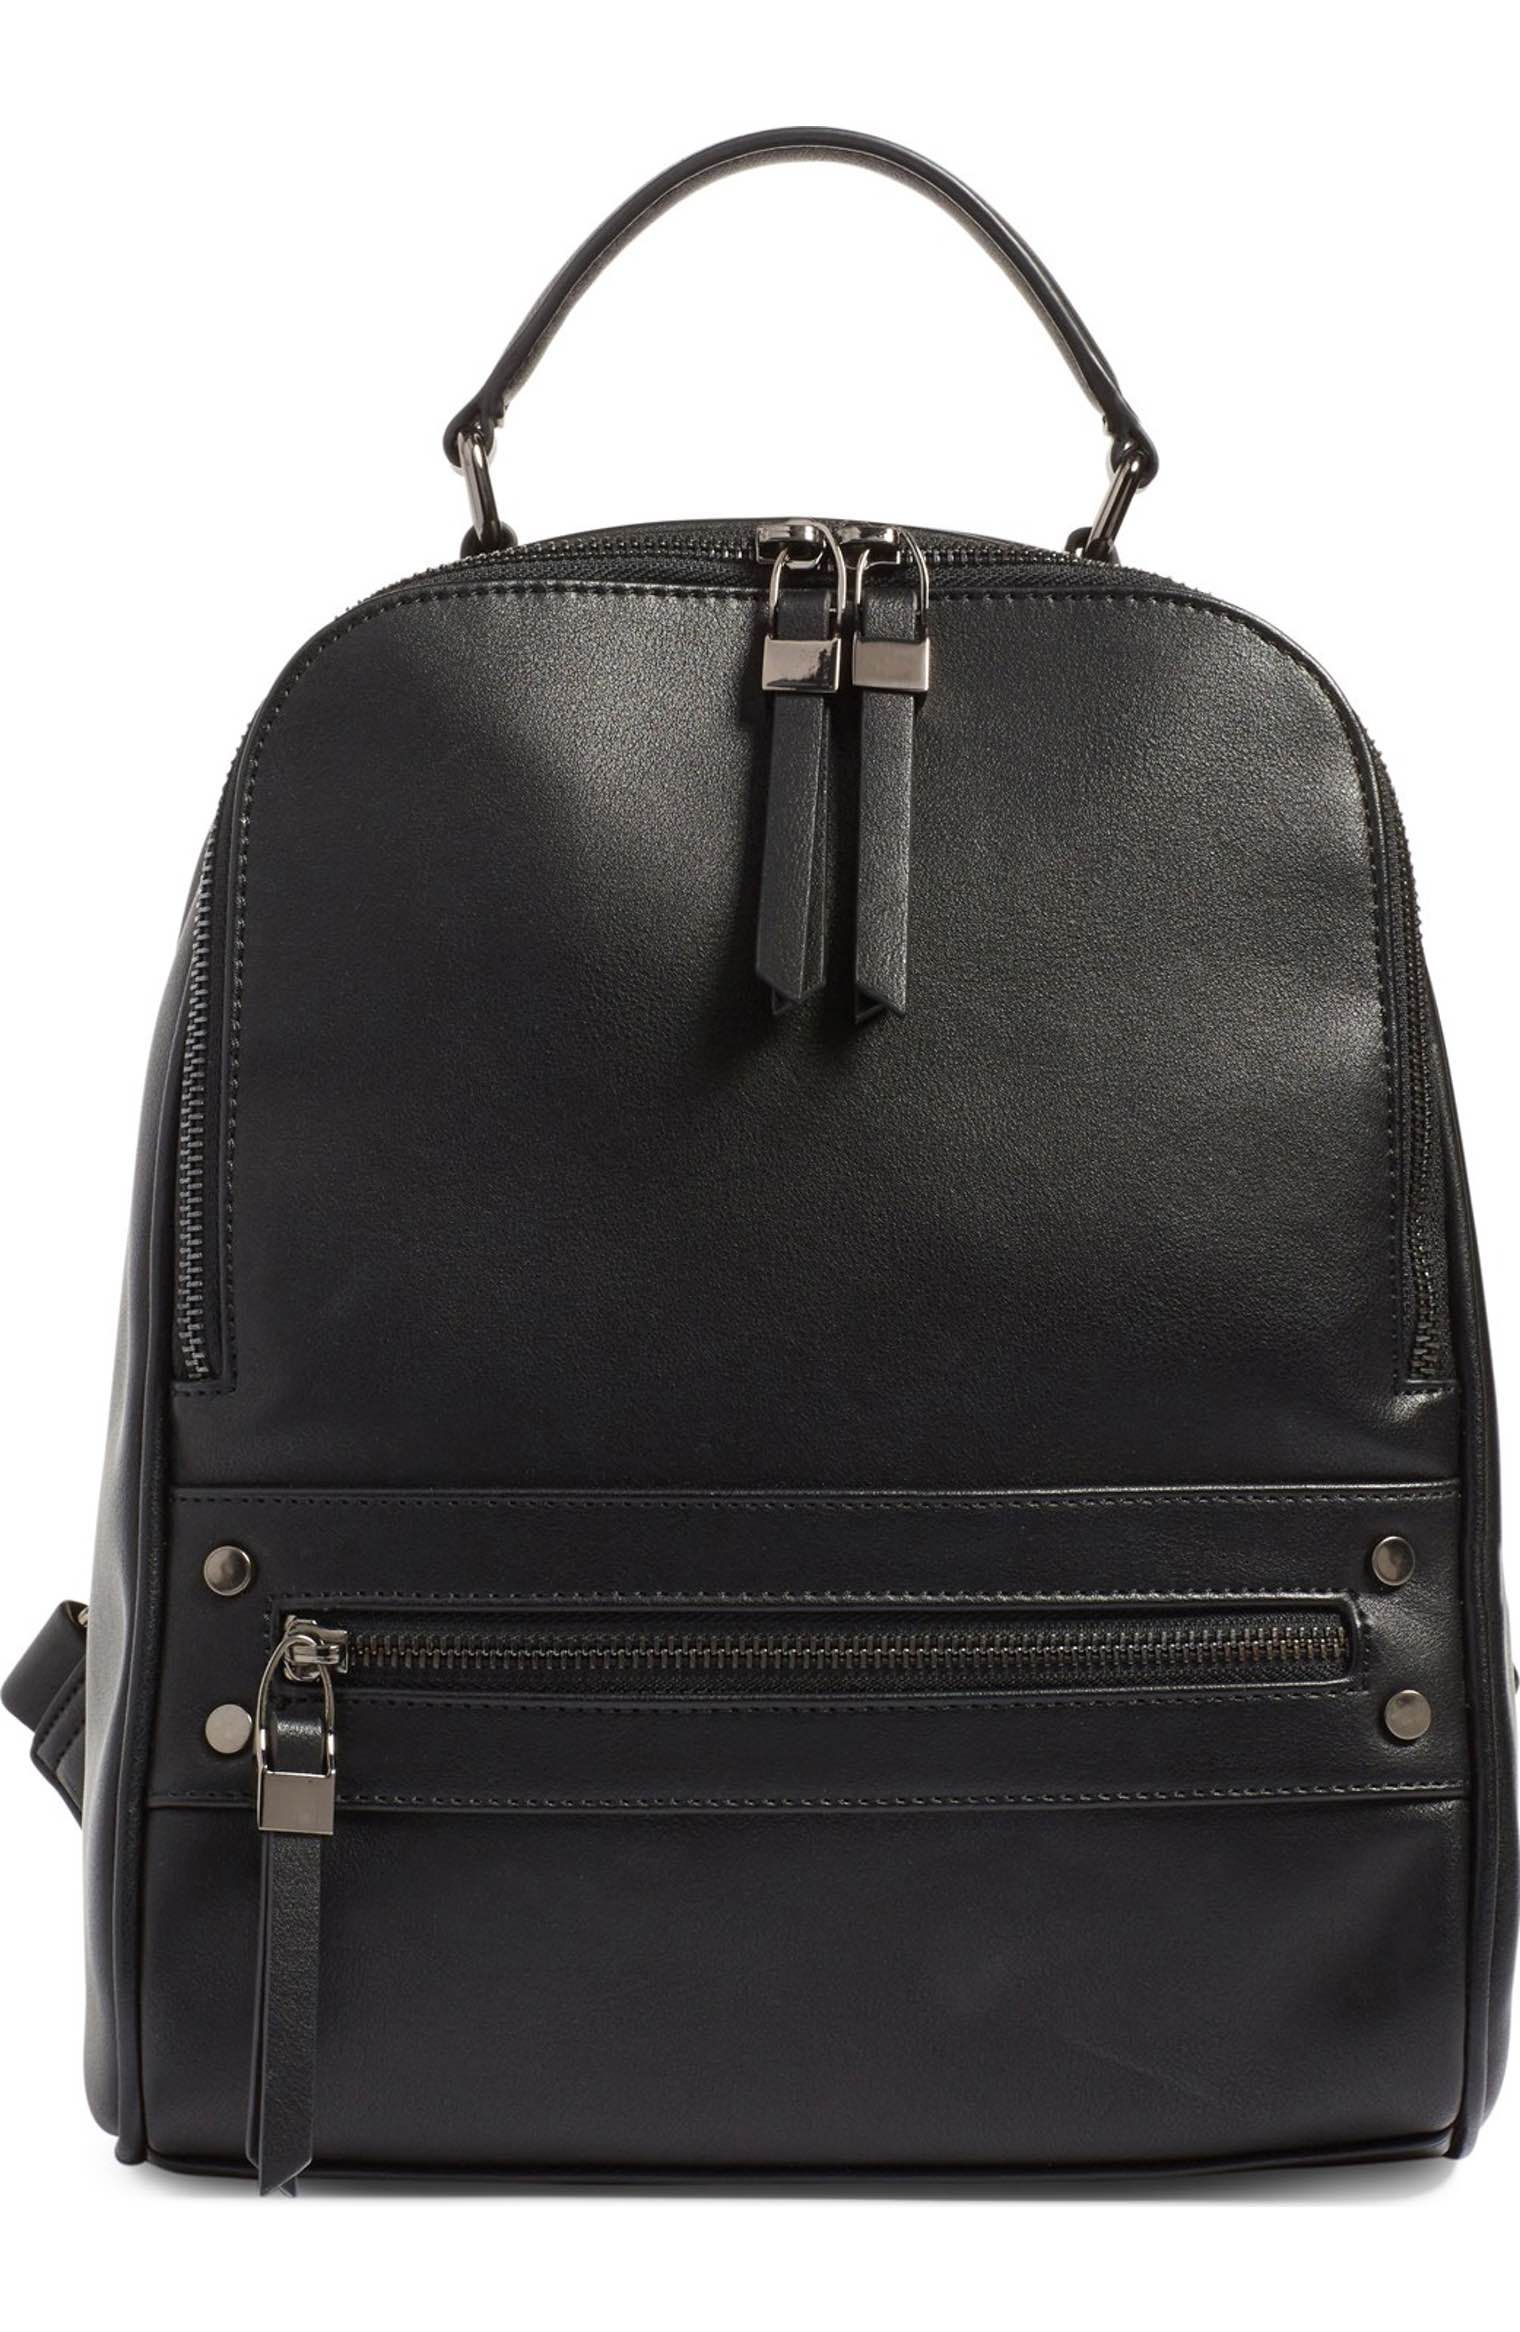 Main Image Phase 3 'City' Backpack 79 City backpack